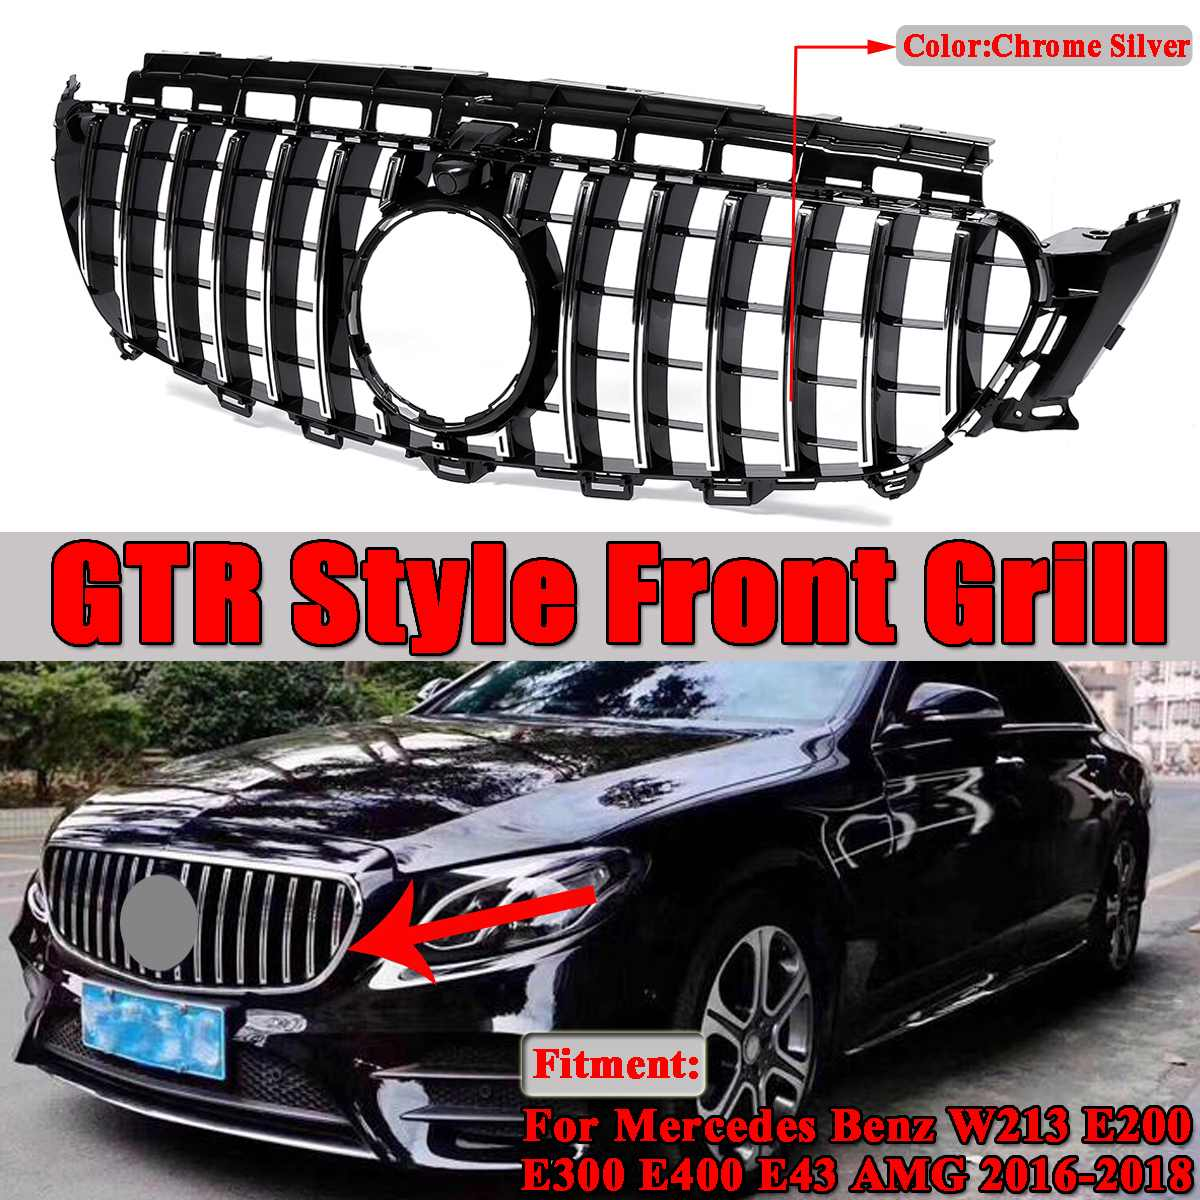 1x GT R/elmas tarzı W213 Grlil için araba ön ızgara Mercedes Benz için W213 E200 E300 E400 E43 AMG 2016 2017 2018 2019